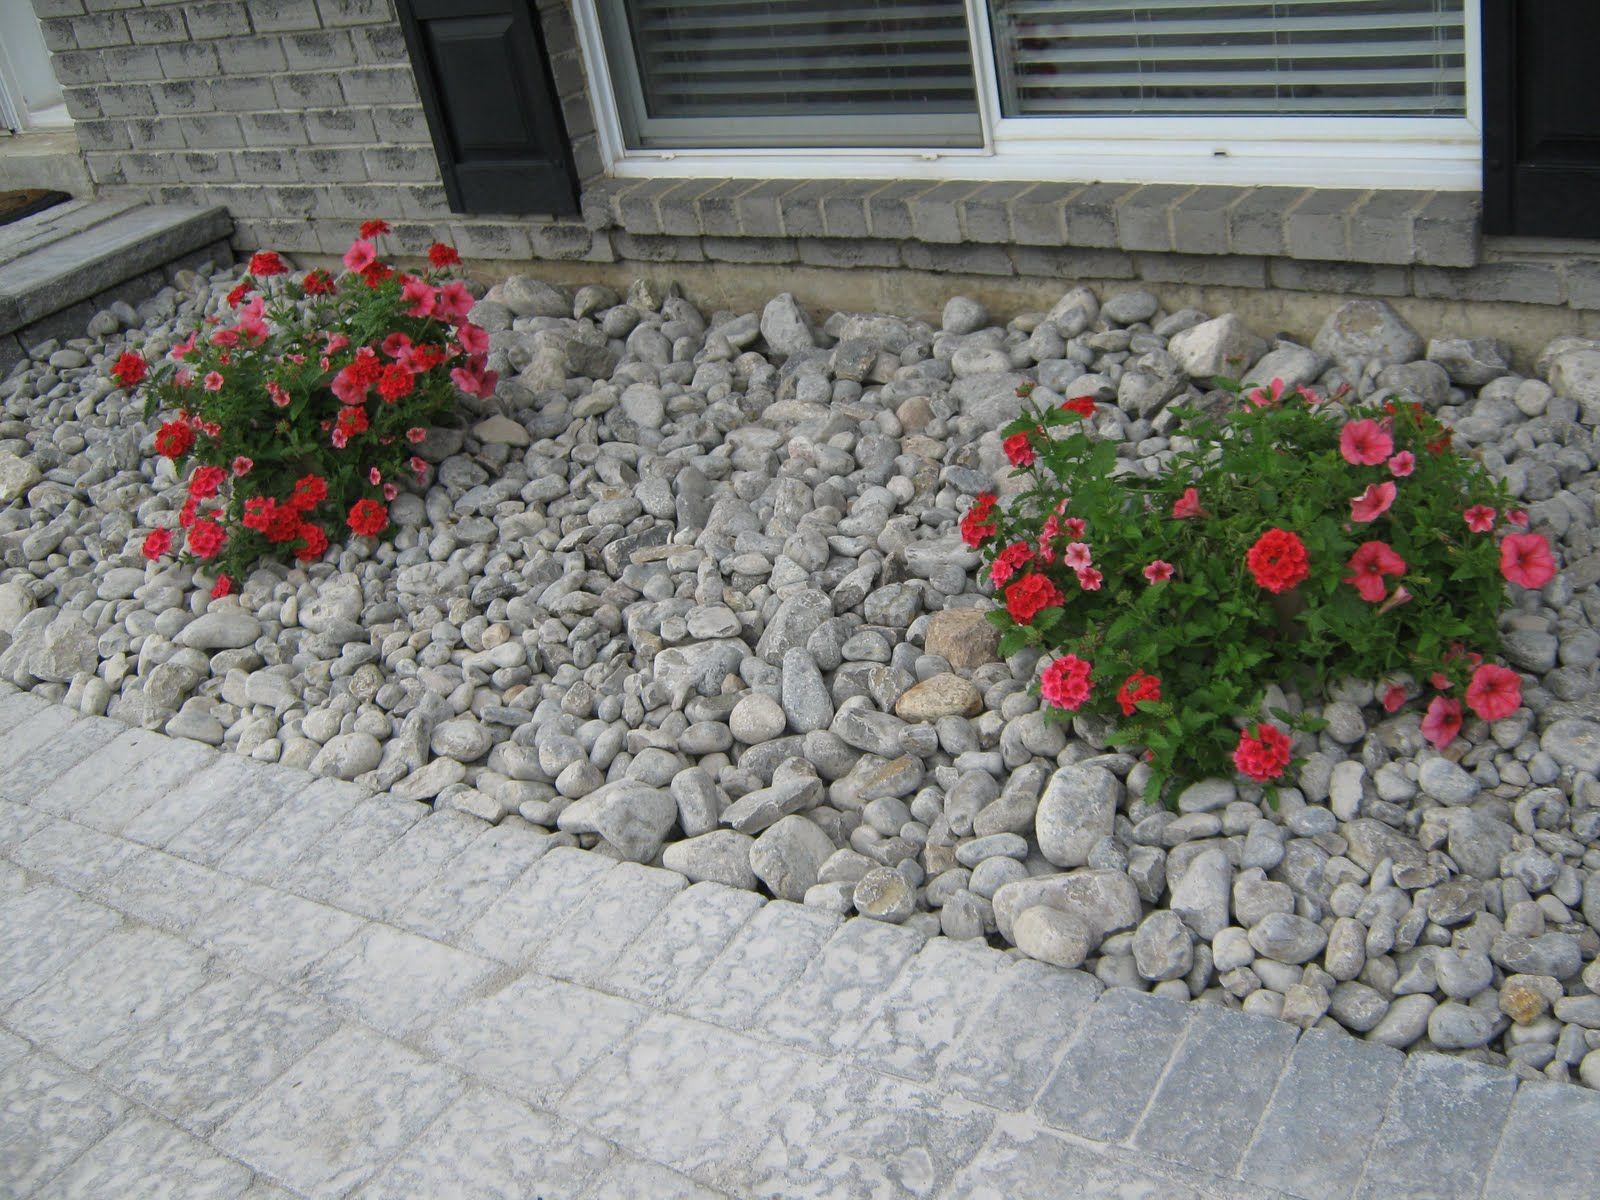 River rock flower bed Stone flower beds, Rock flower beds